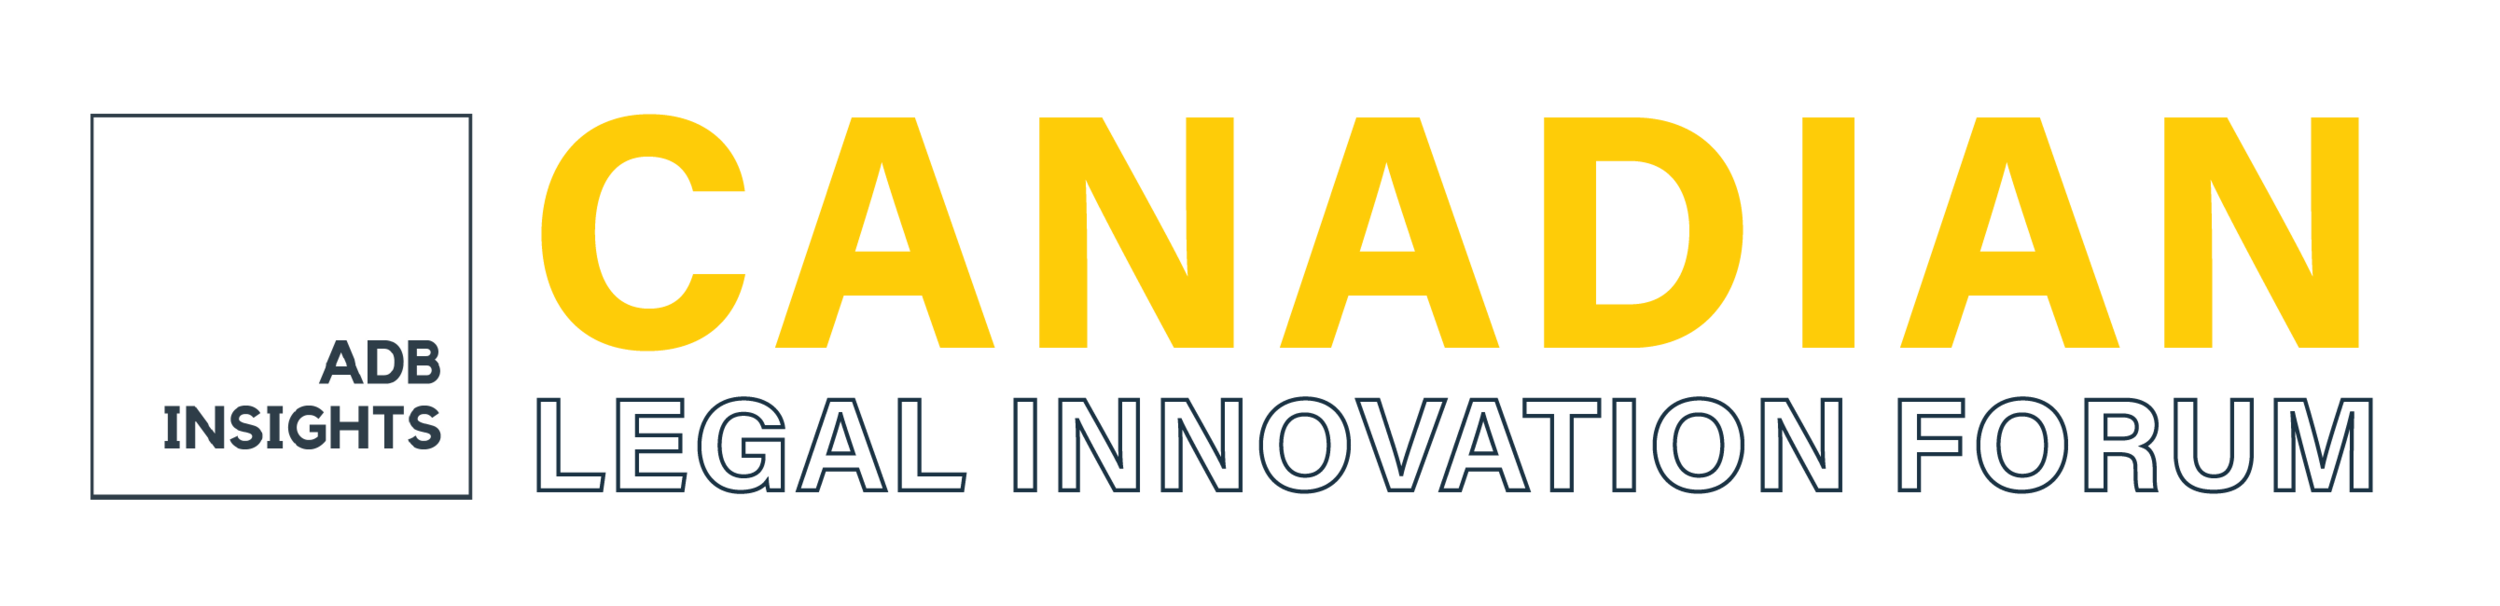 ADB Can logo-11.png